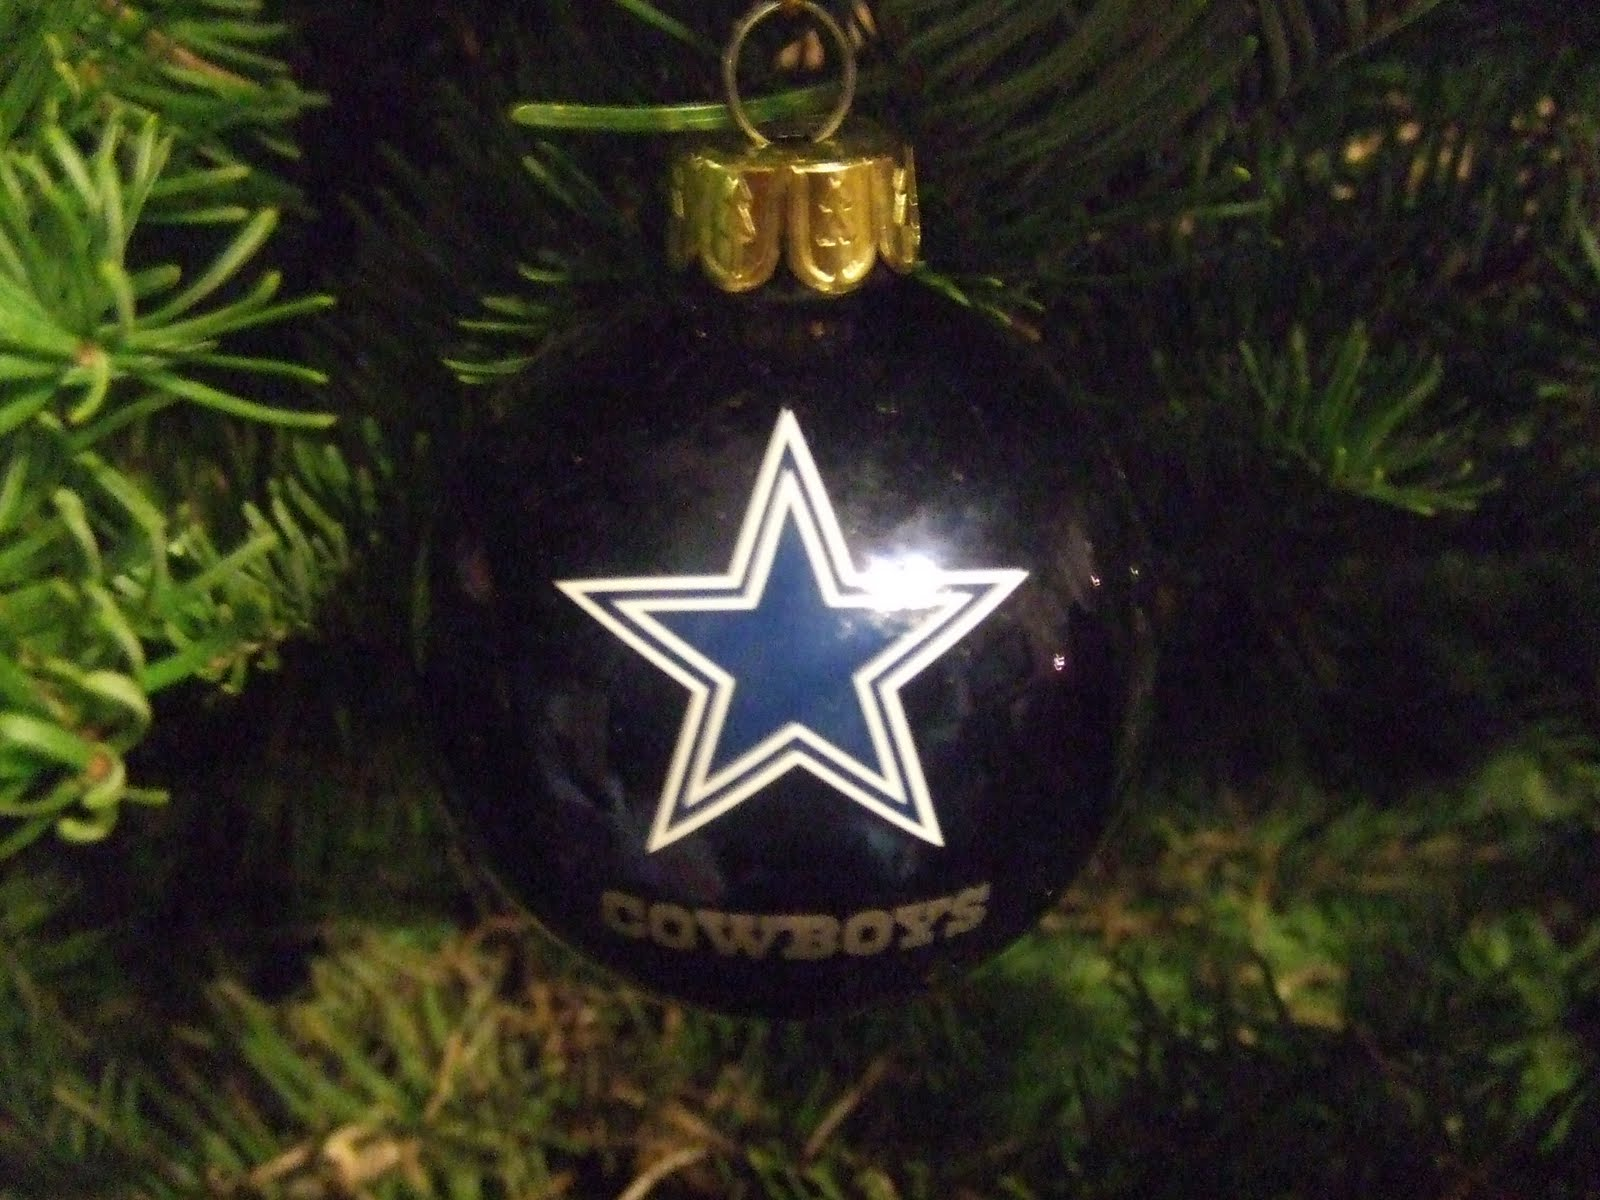 Dallas Cowboys Christmas Wallpapers - Wallpaper Cave